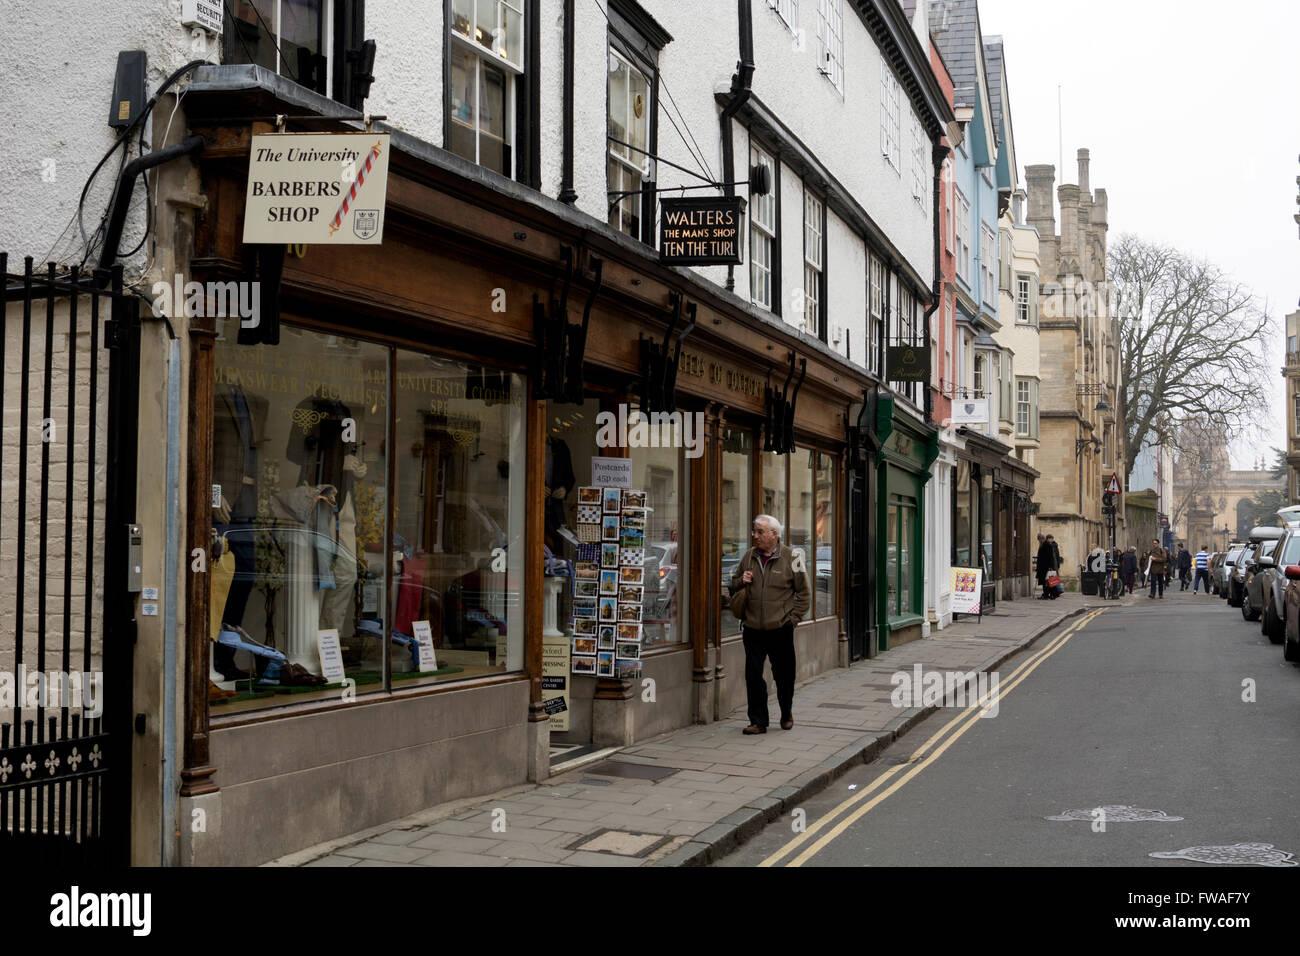 Turl Street, Oxford city centre, UK - Stock Image